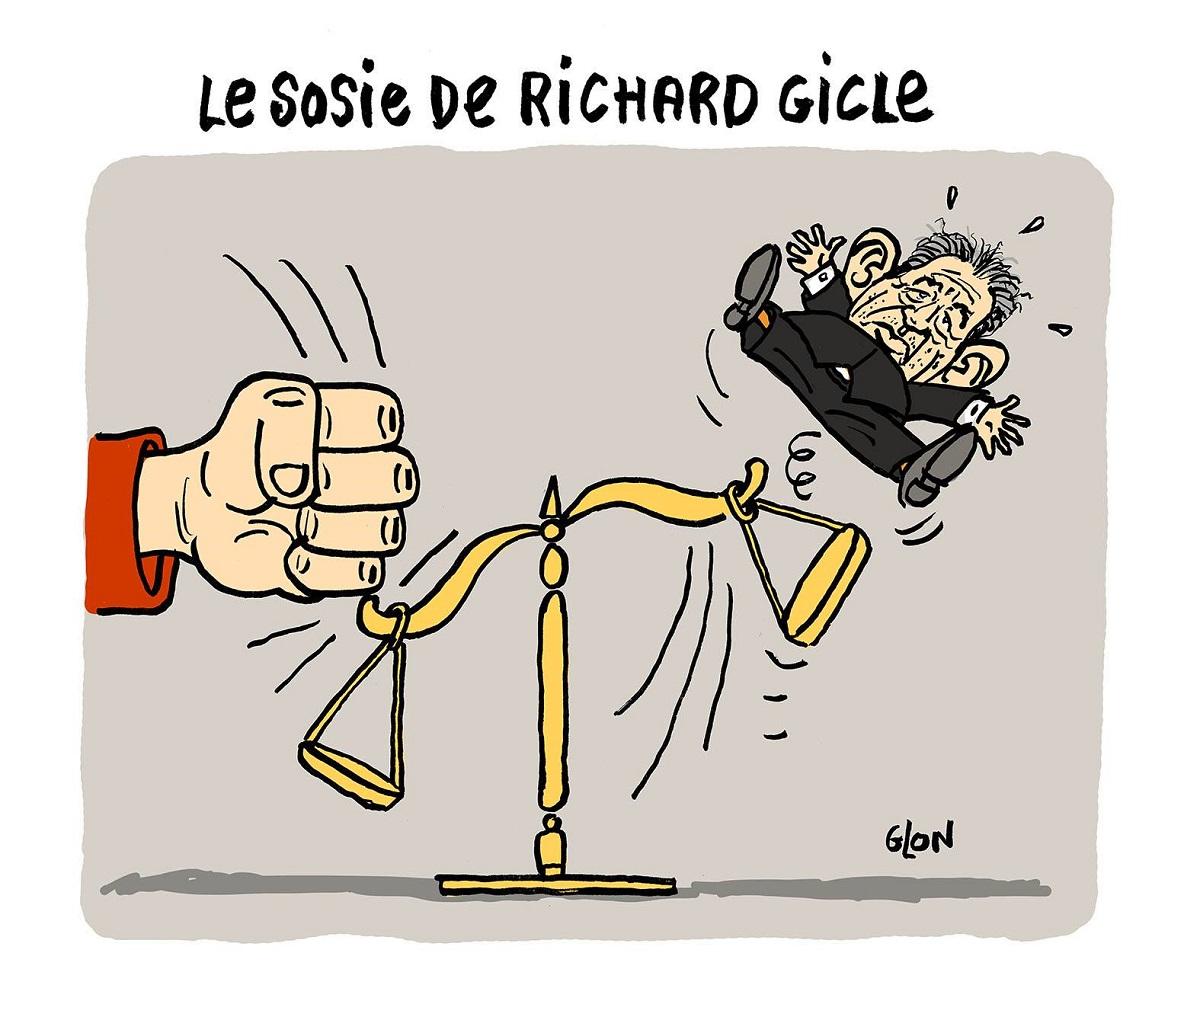 dessin humoristique de la balance de la justice éjectant François Bayrou